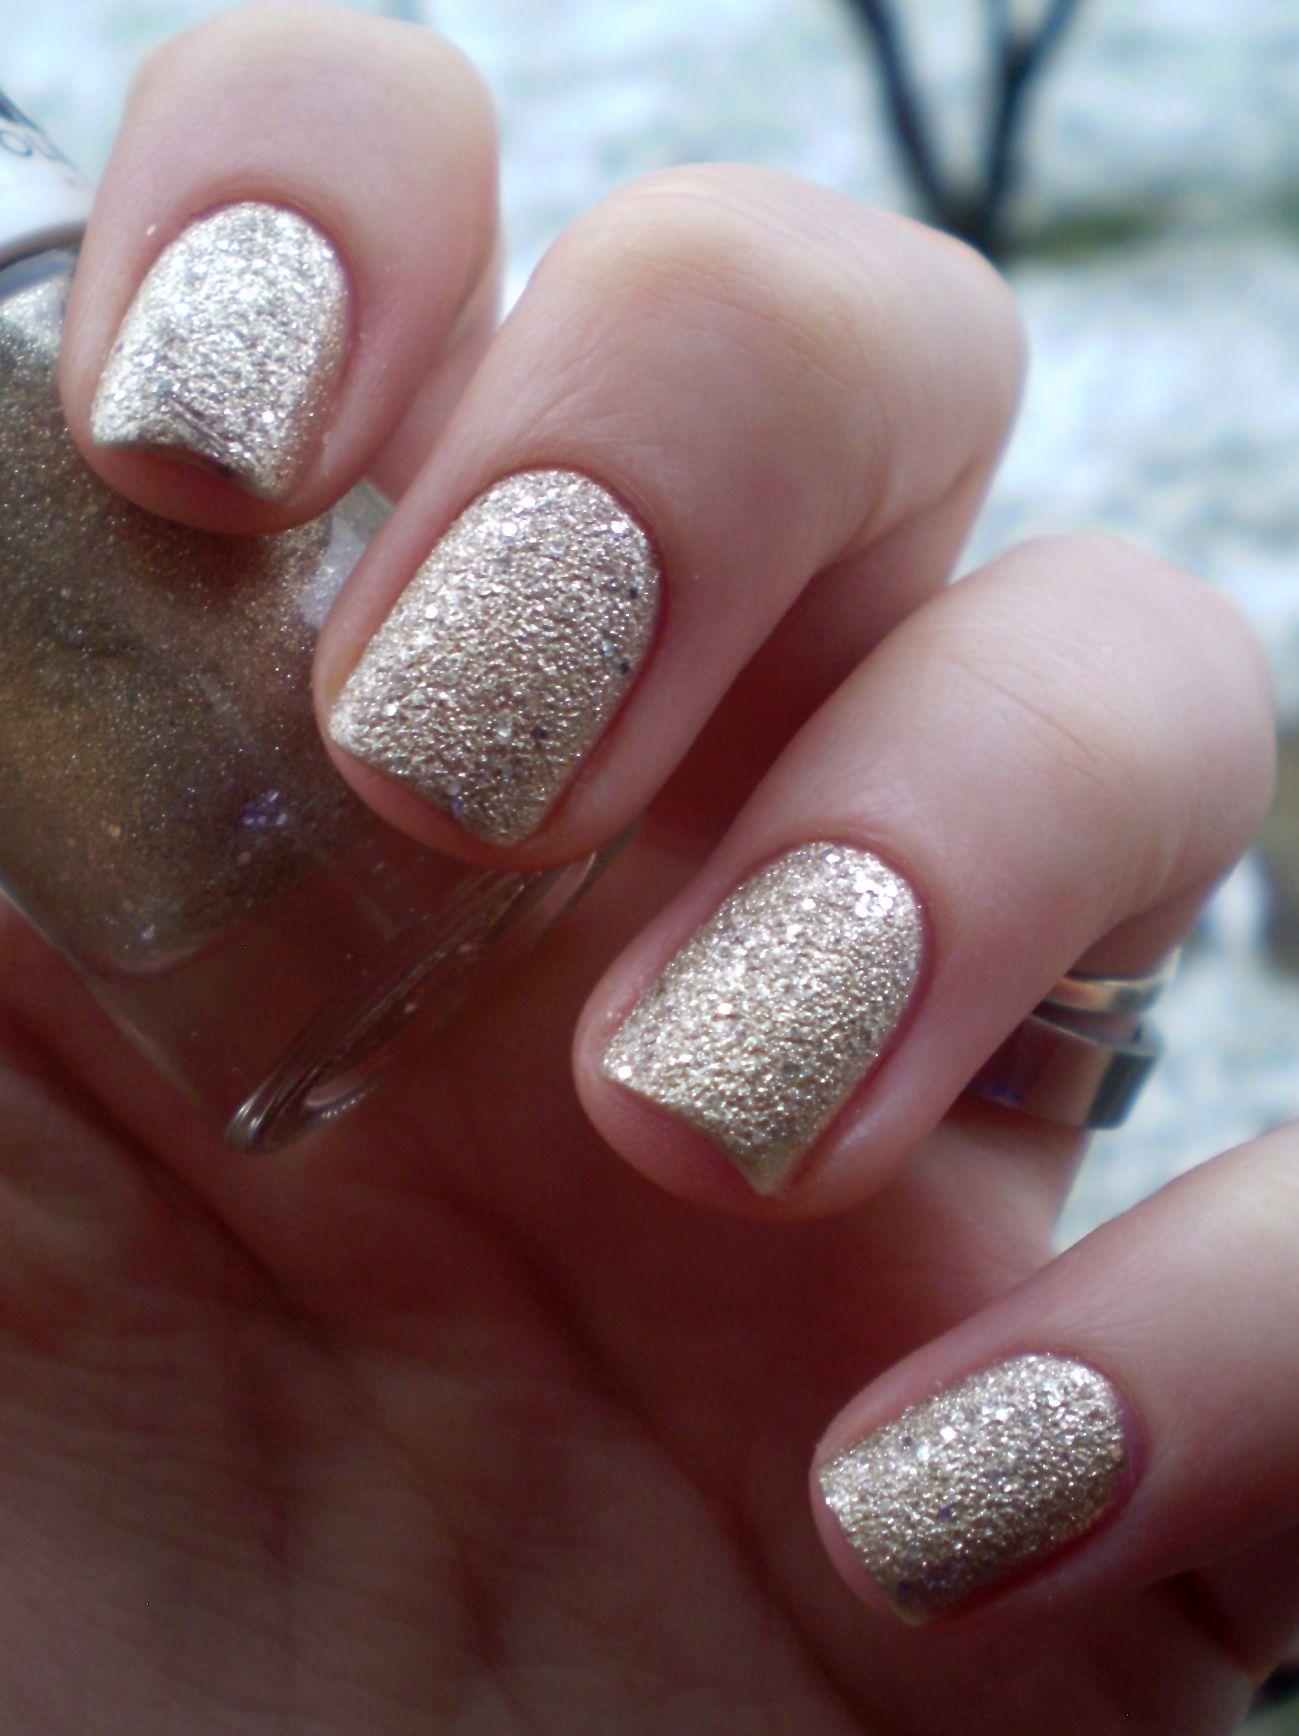 Look by Bipa Coloured Sand Nail Polish - Glitter Gold http://bits-n ...